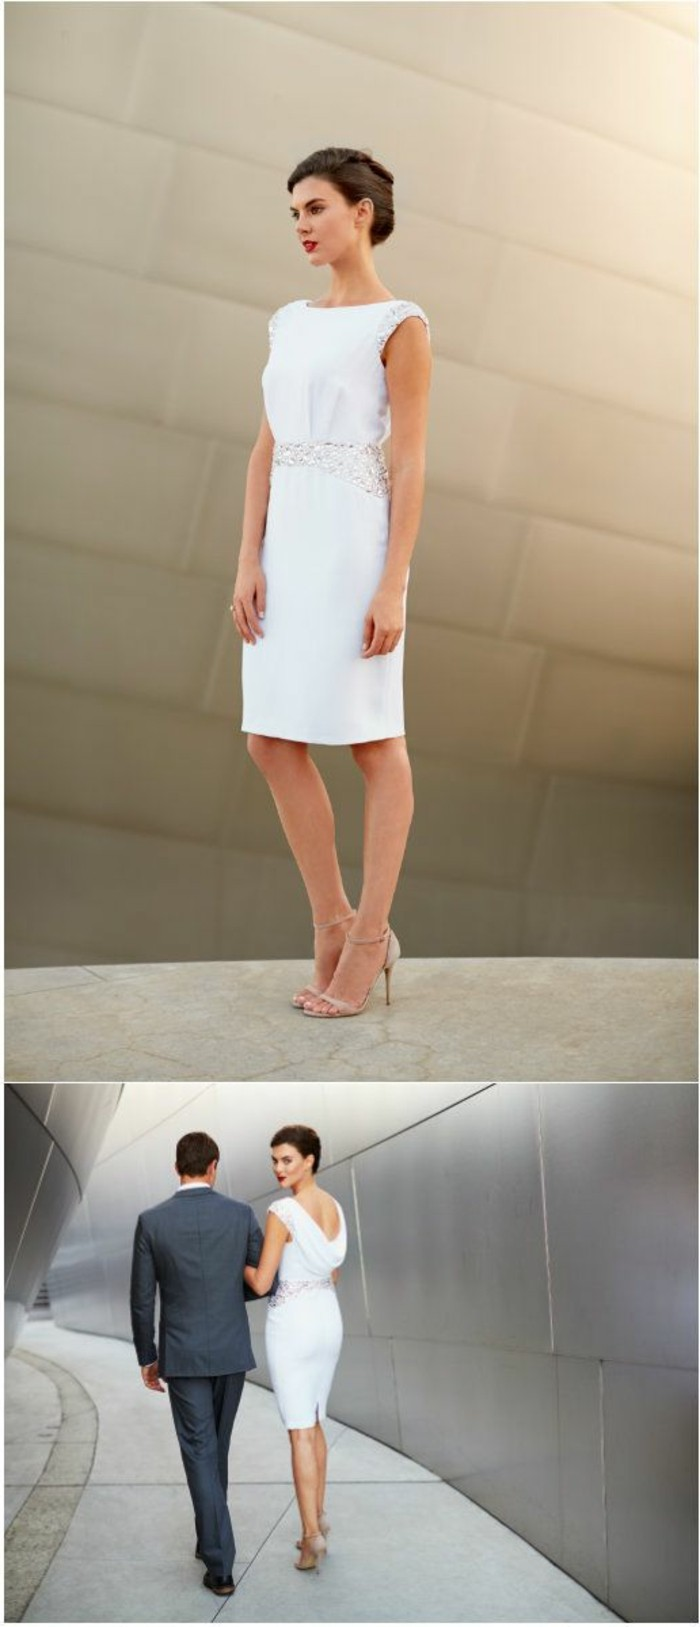 robe-de-mariage-civil-blanche-talons-hauts-sandales-blancs-jolie-robe-blanche